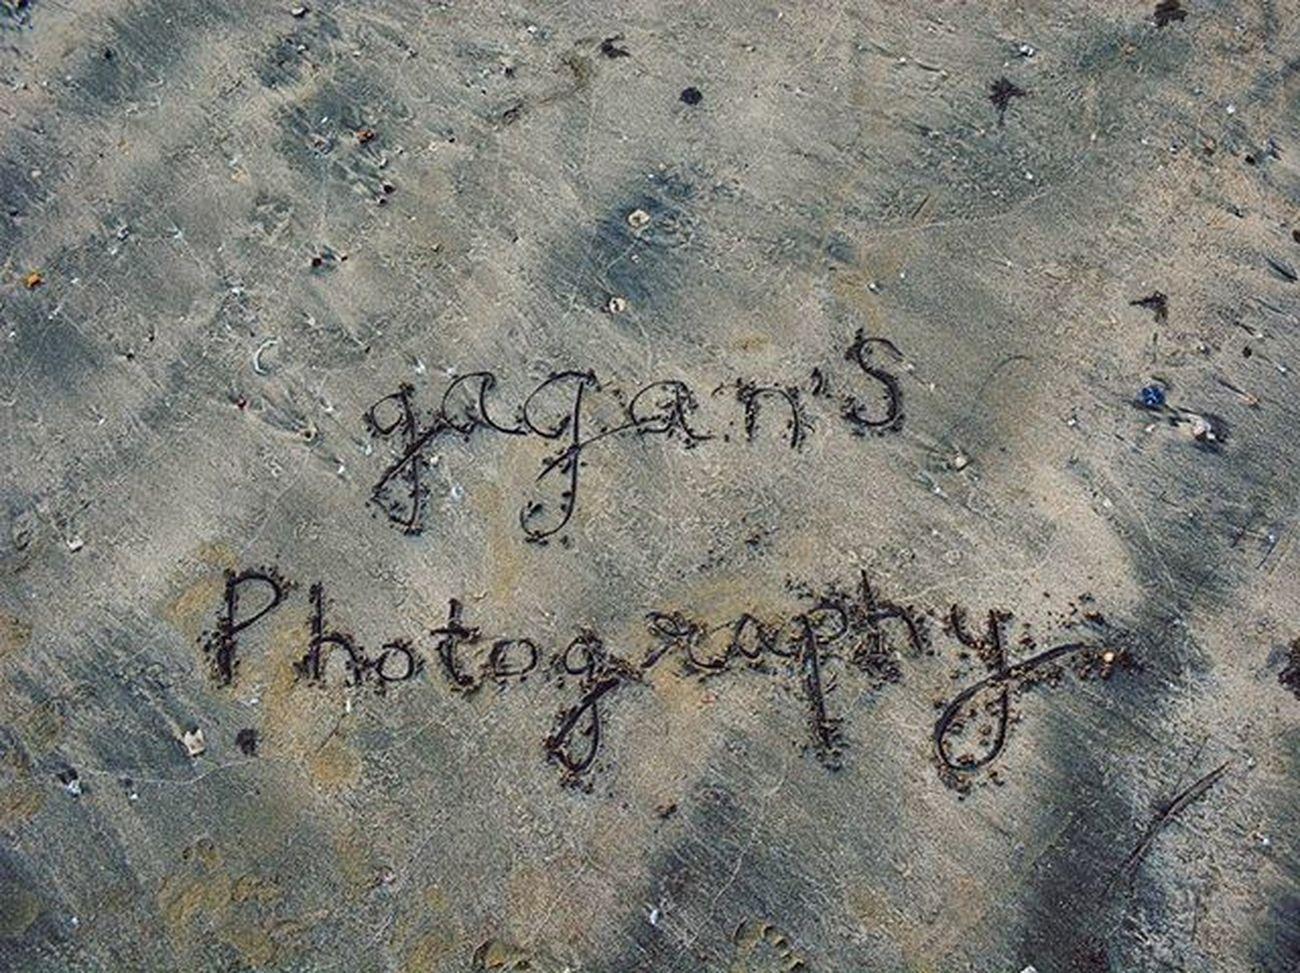 Marking My Territory Goa Gagans_photography Aeshkydiwedding Love you all followers...